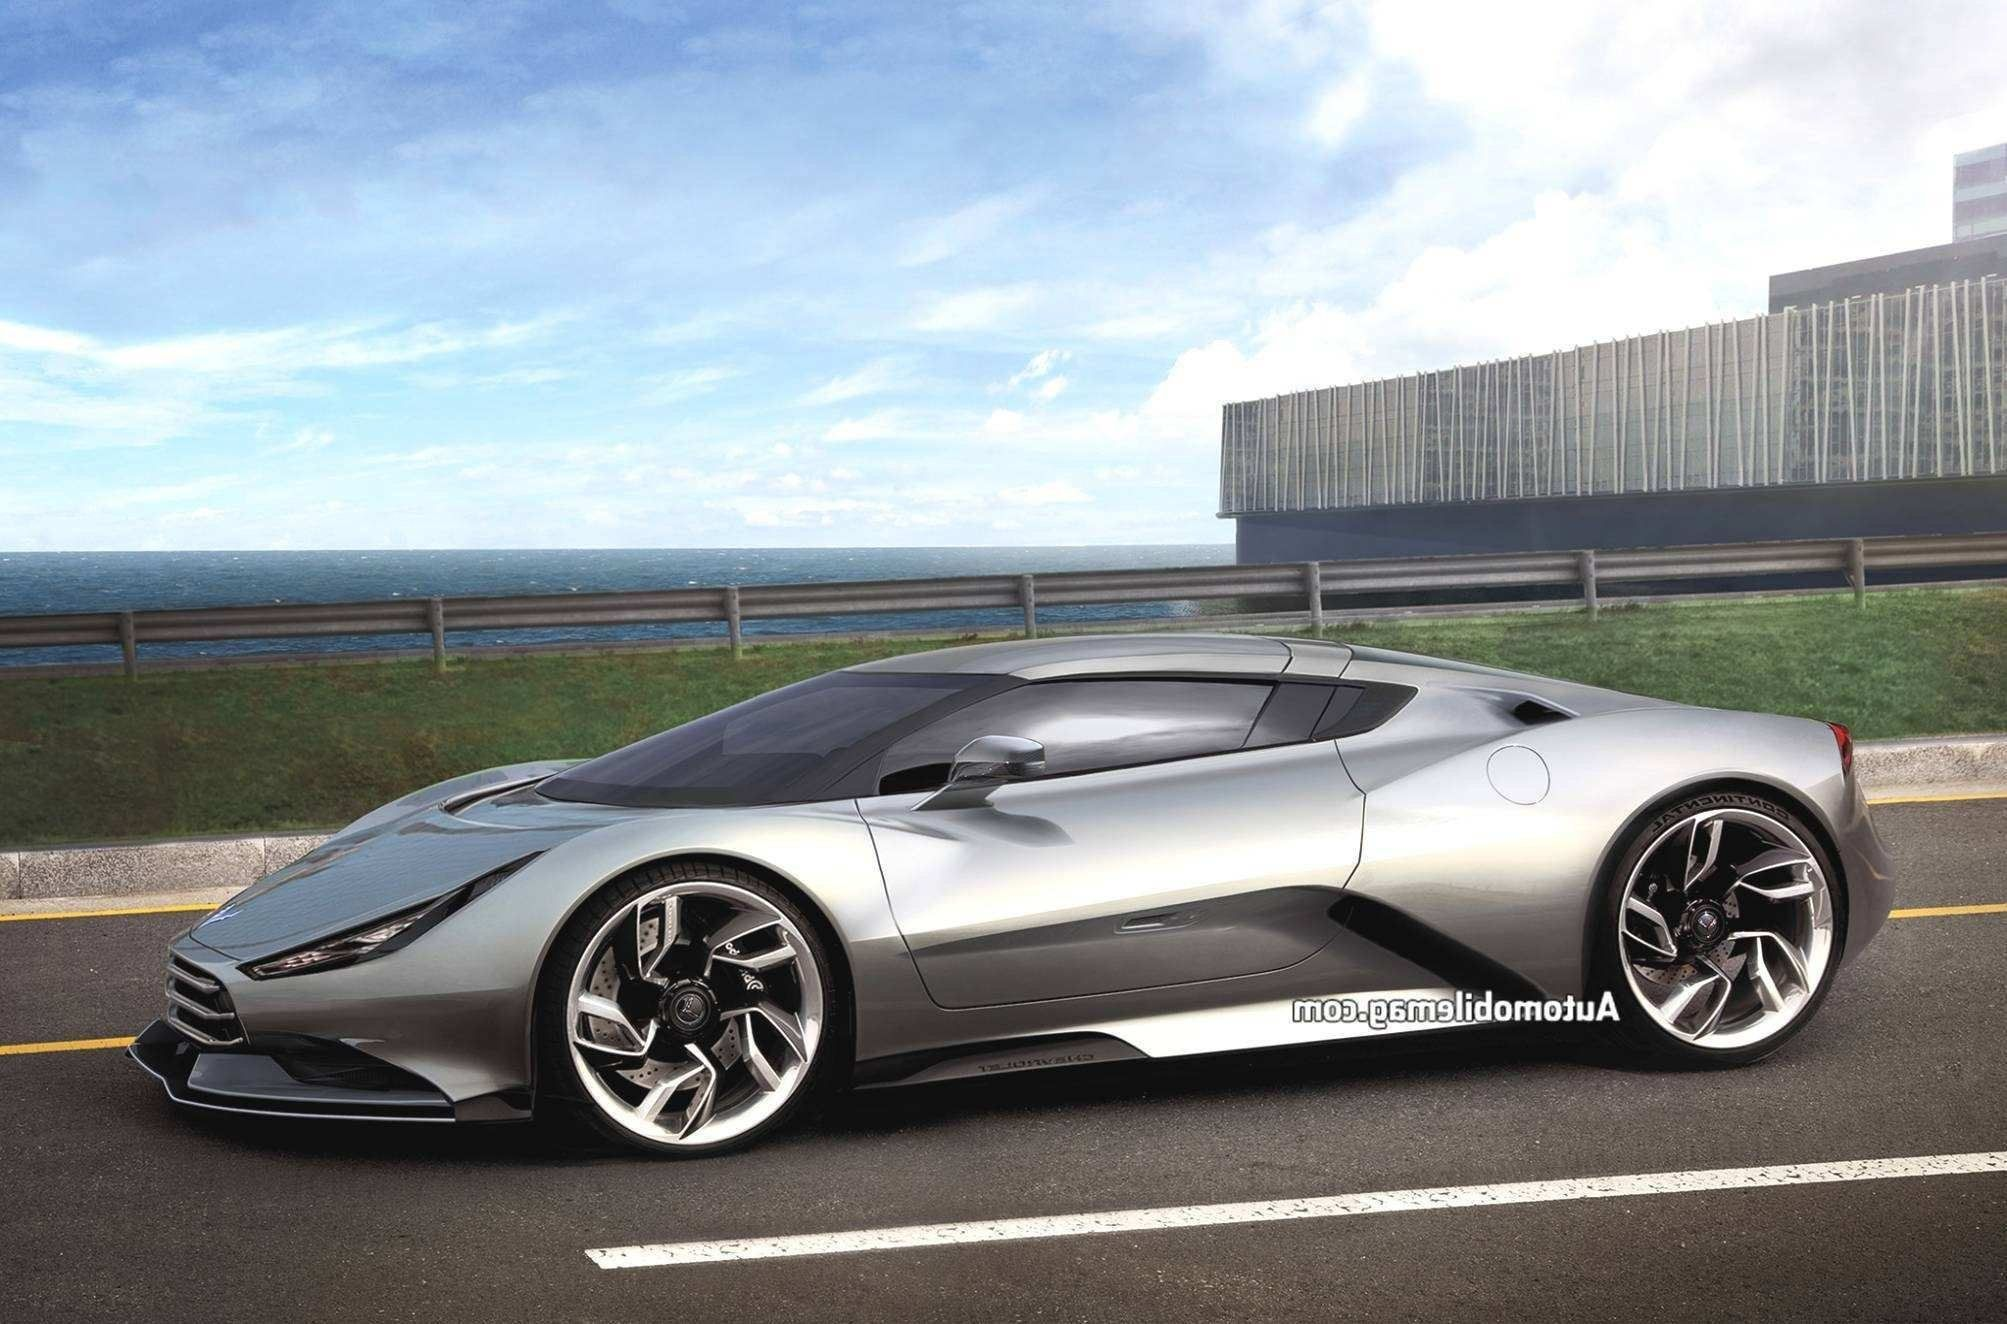 2020 Chevrolet Corvette Zora Zr1 Concept